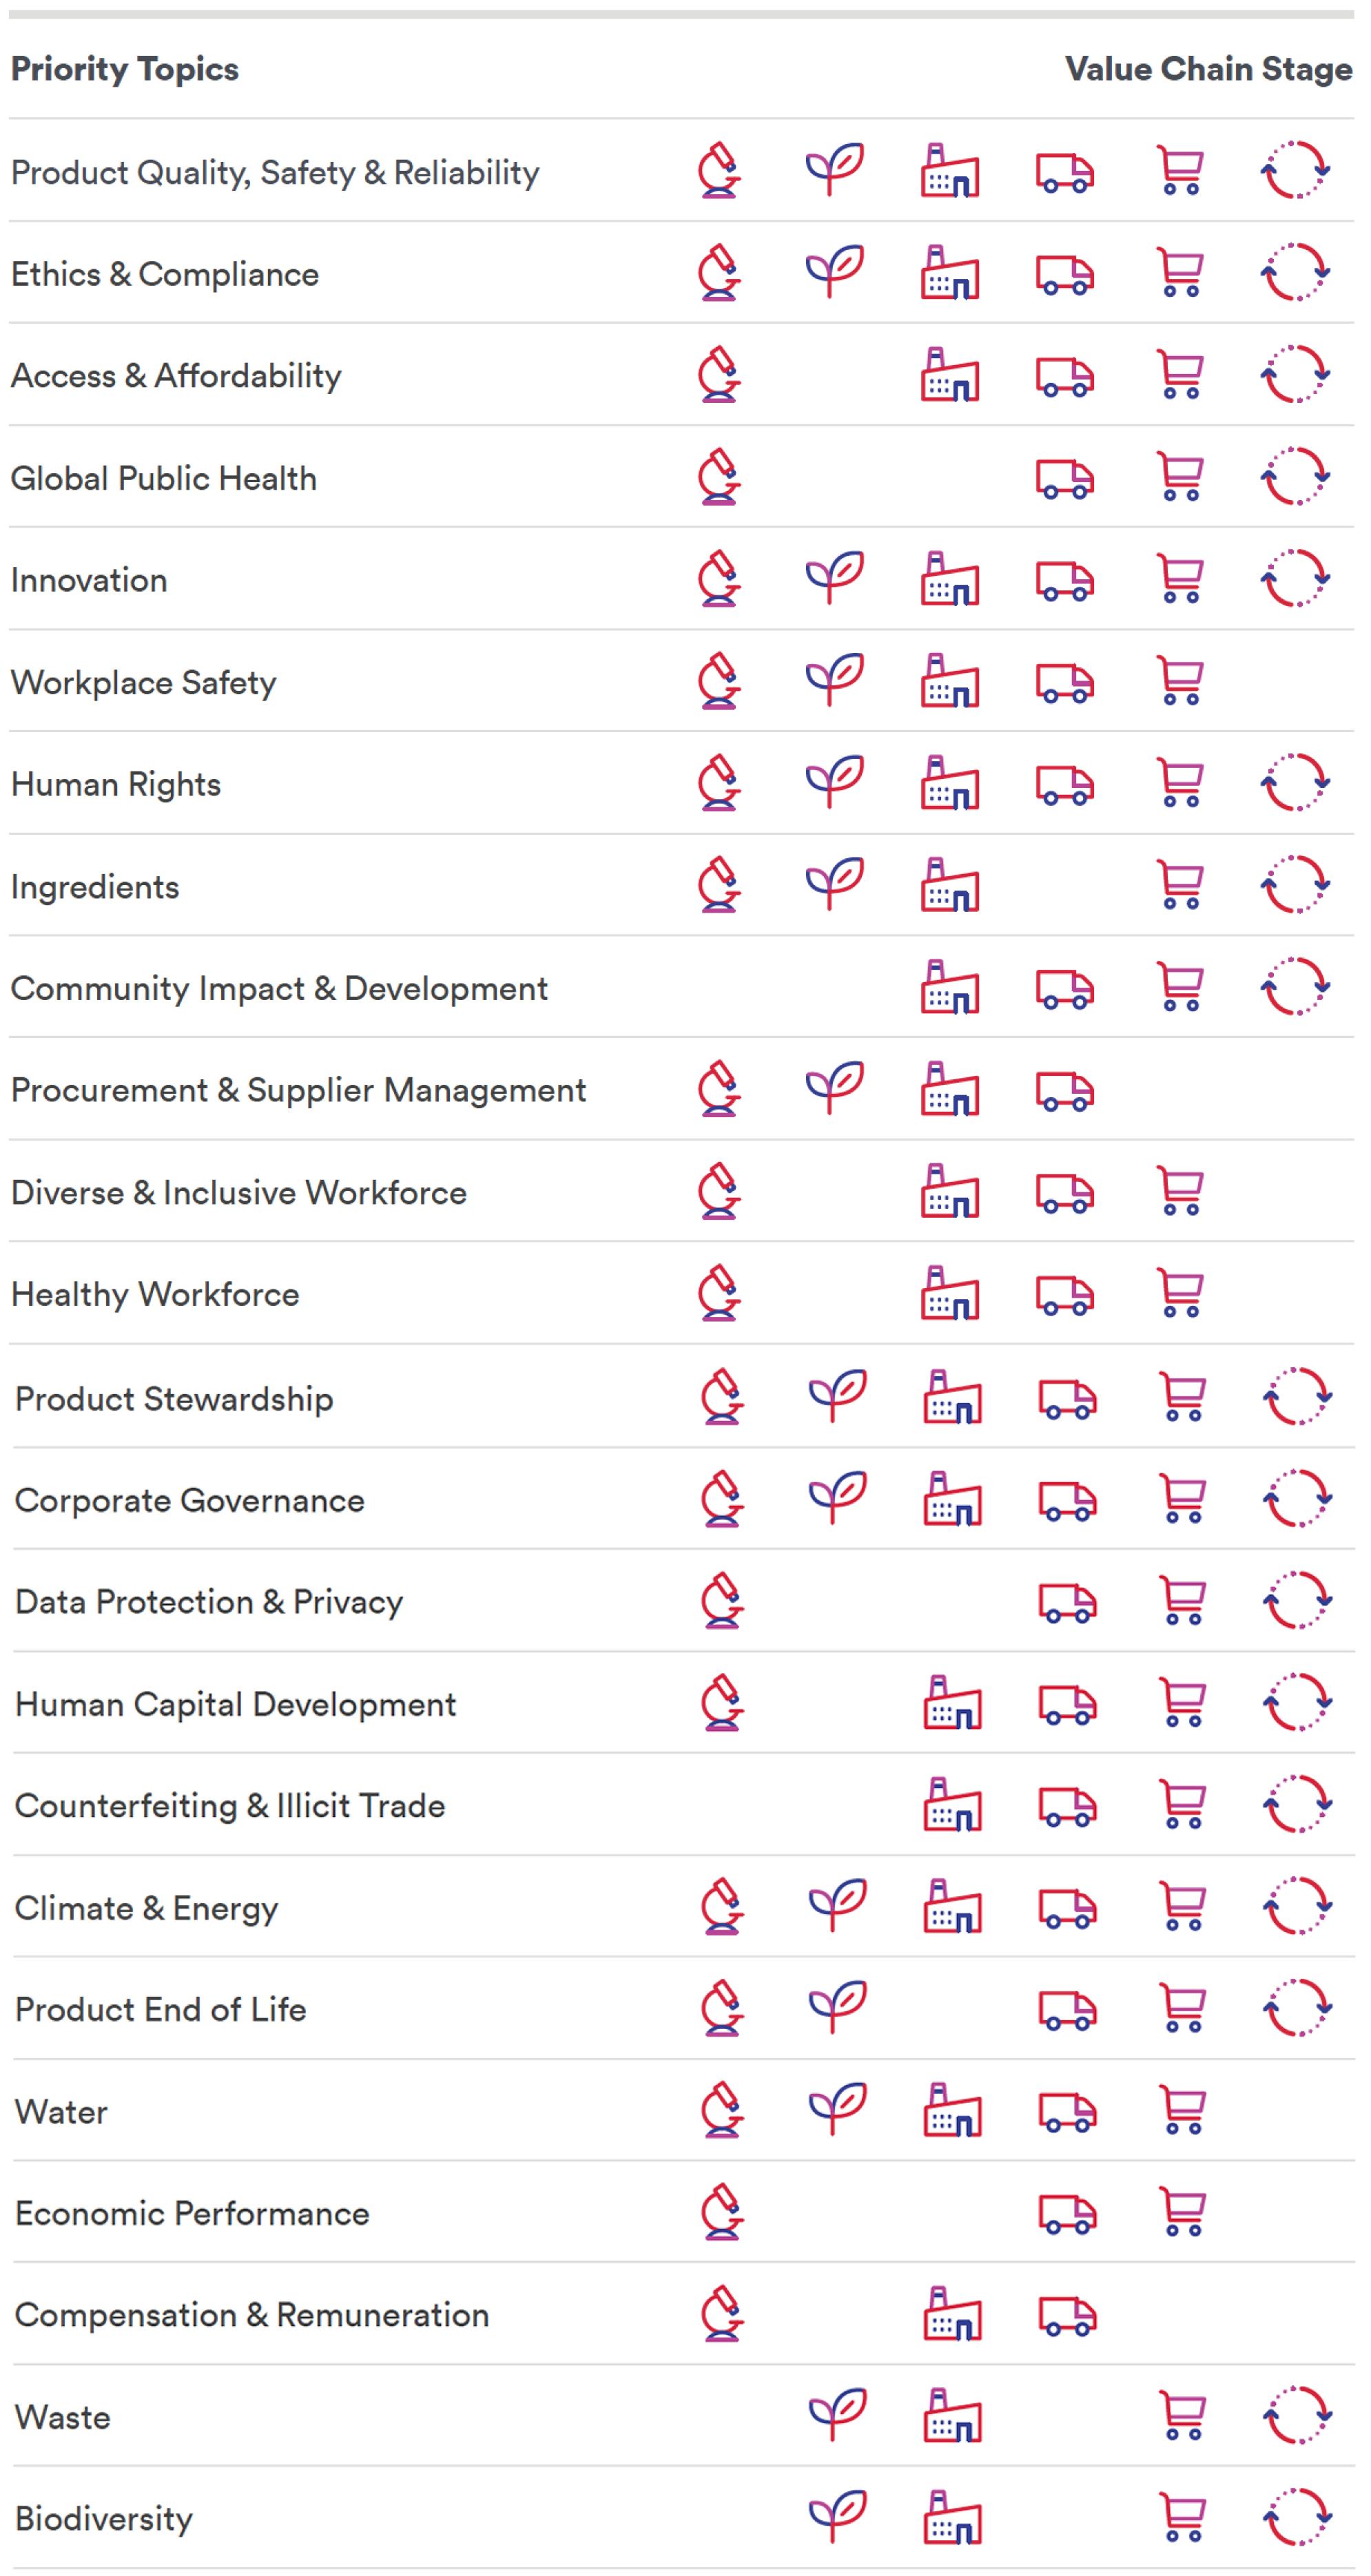 Priority Topics & Value Chain